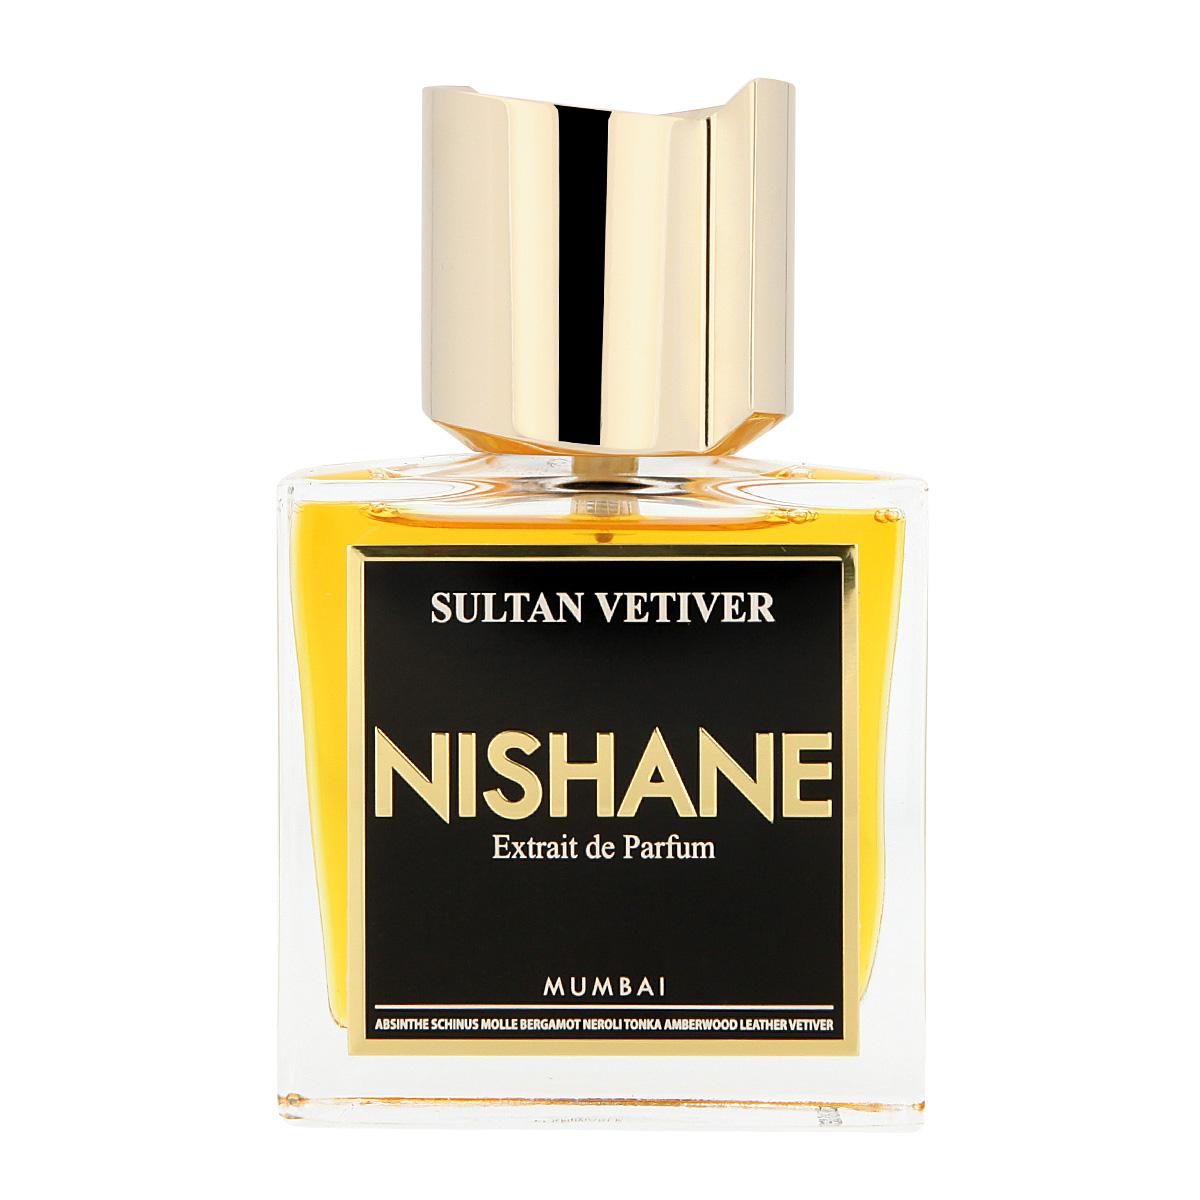 Nishane Sultan Vetiver Extrait de Parfum 50 ml (unisex) 130854